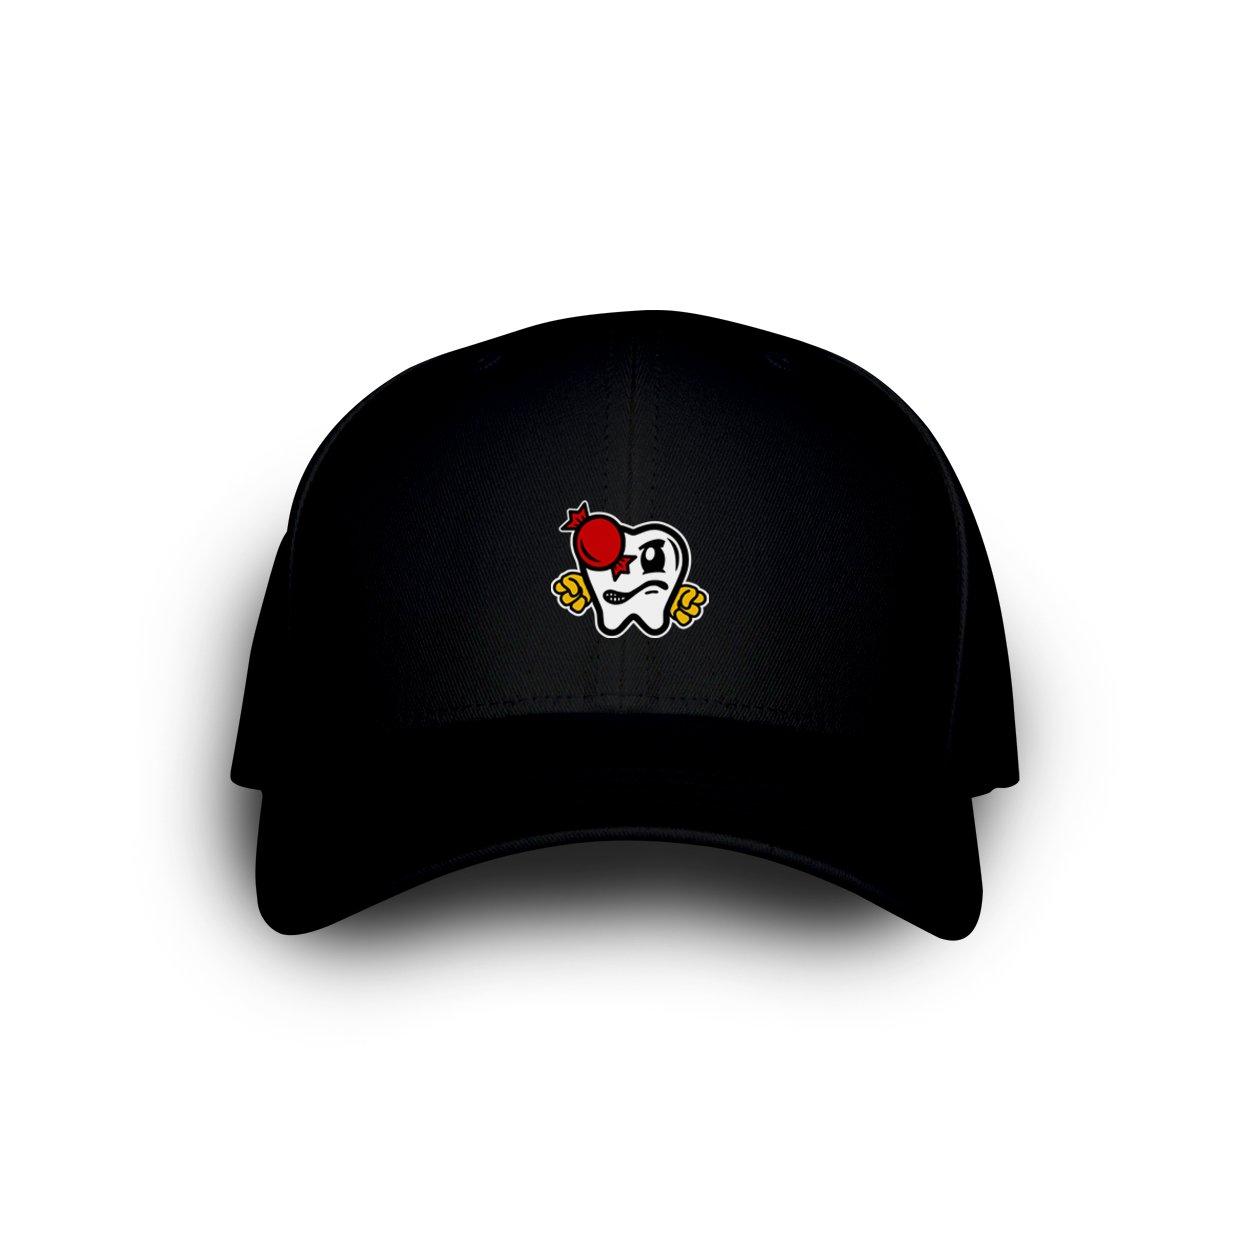 Image of OG VITAS DAD CAP BLACK